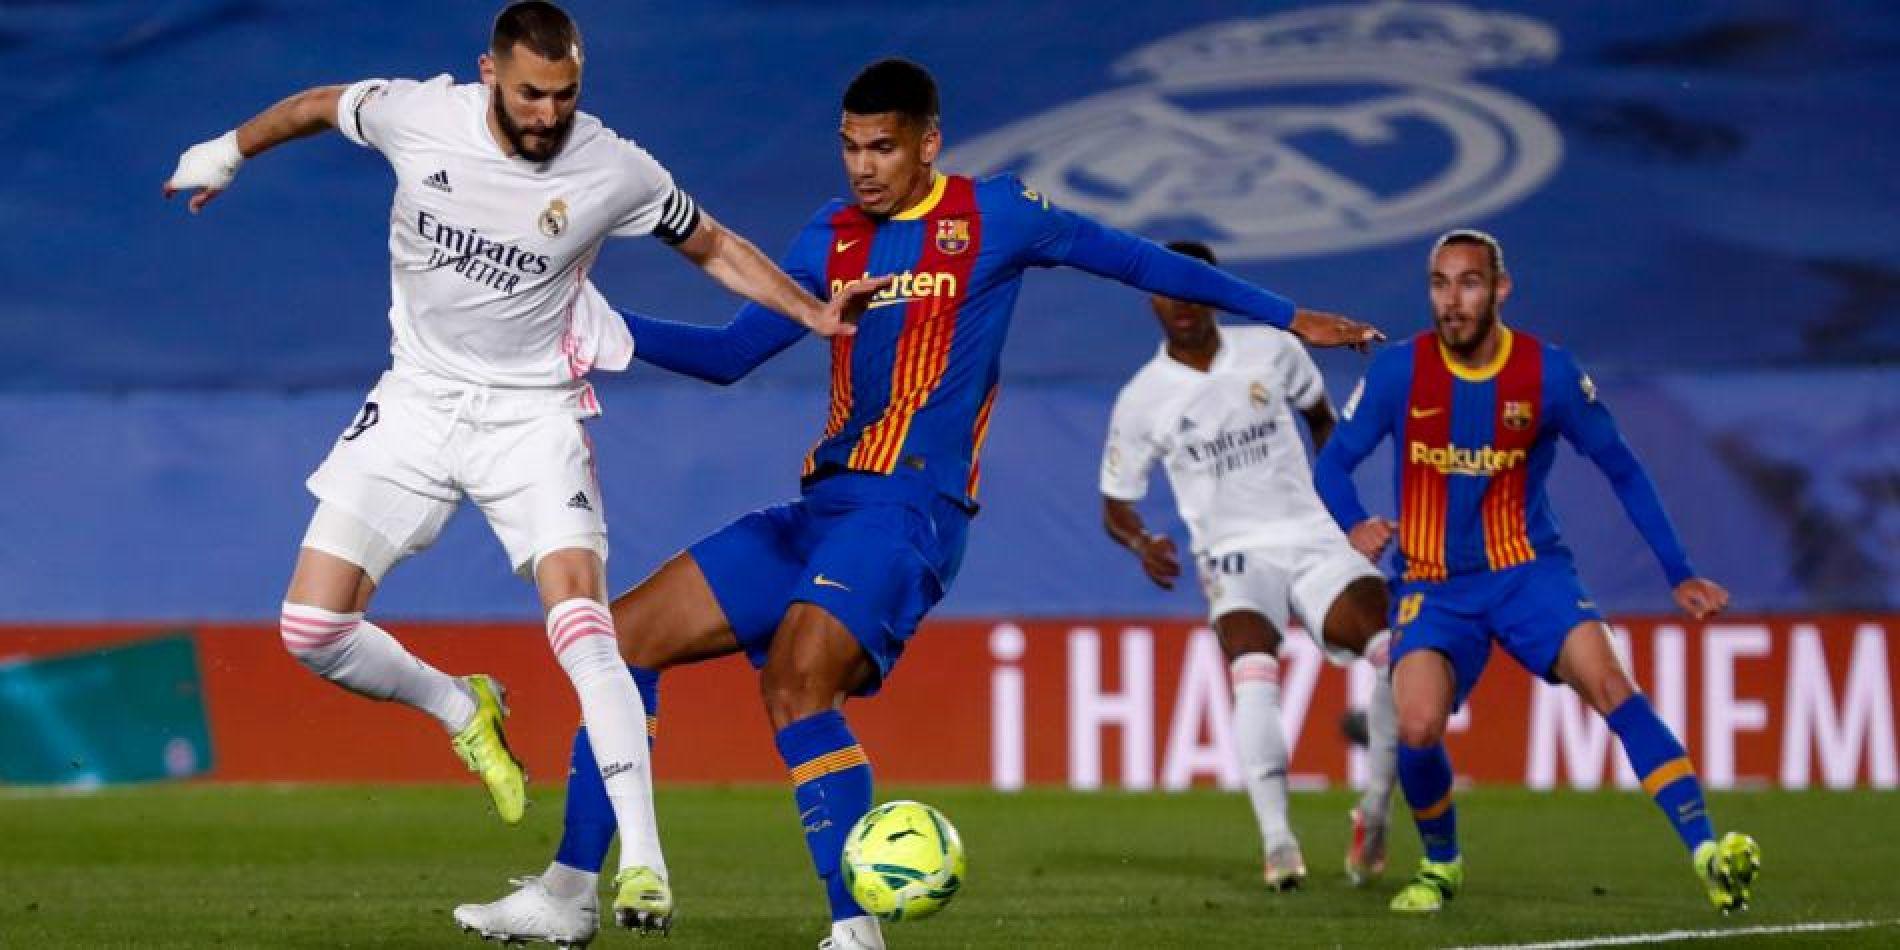 Taco de Benzema para anotar el primer gol del partido.